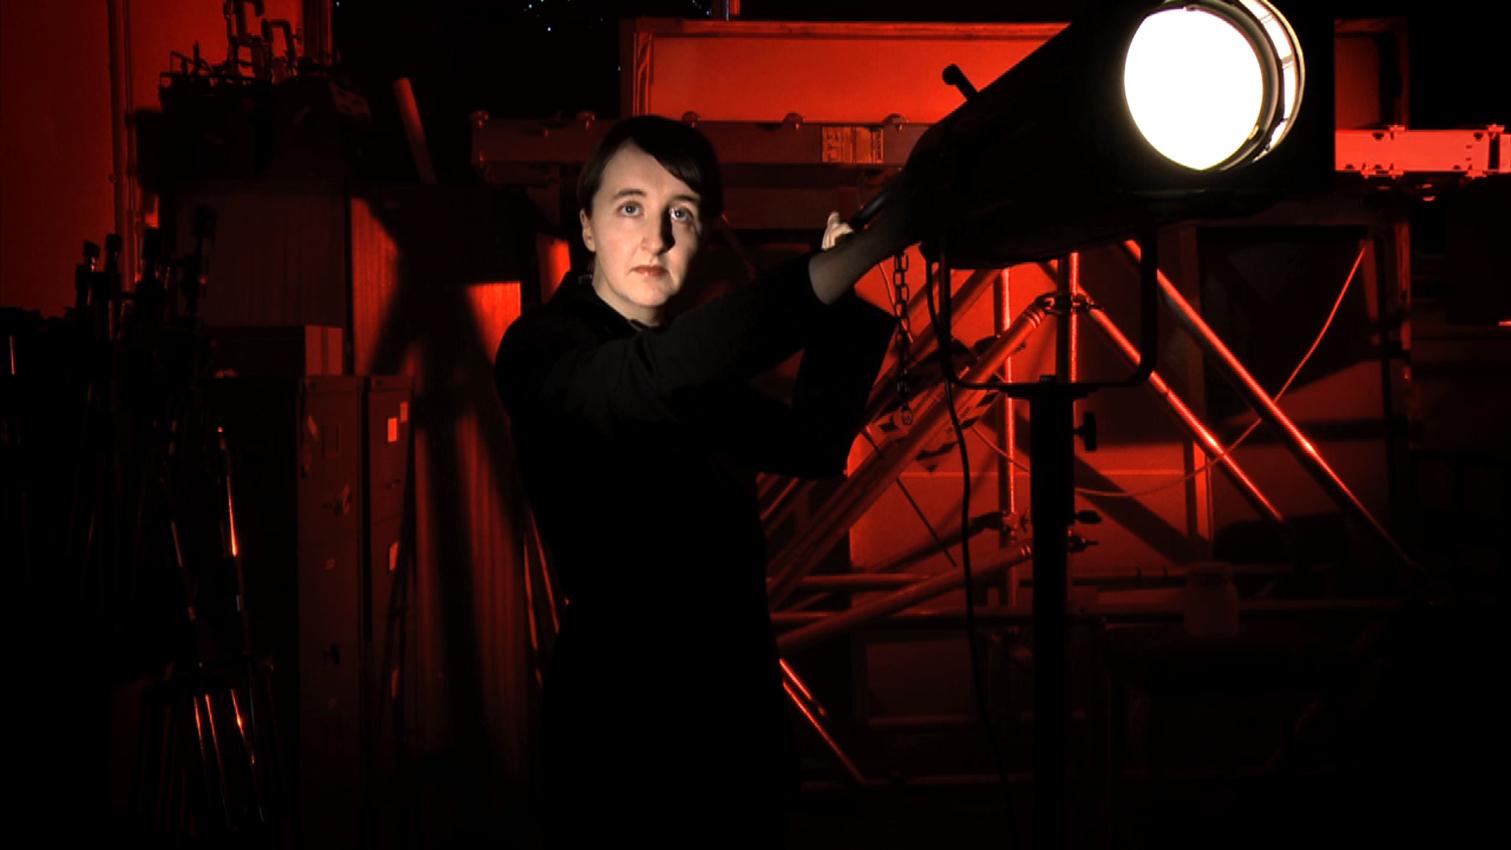 Xenon: the film (still), 2012. Feat. Amy Cunningham.